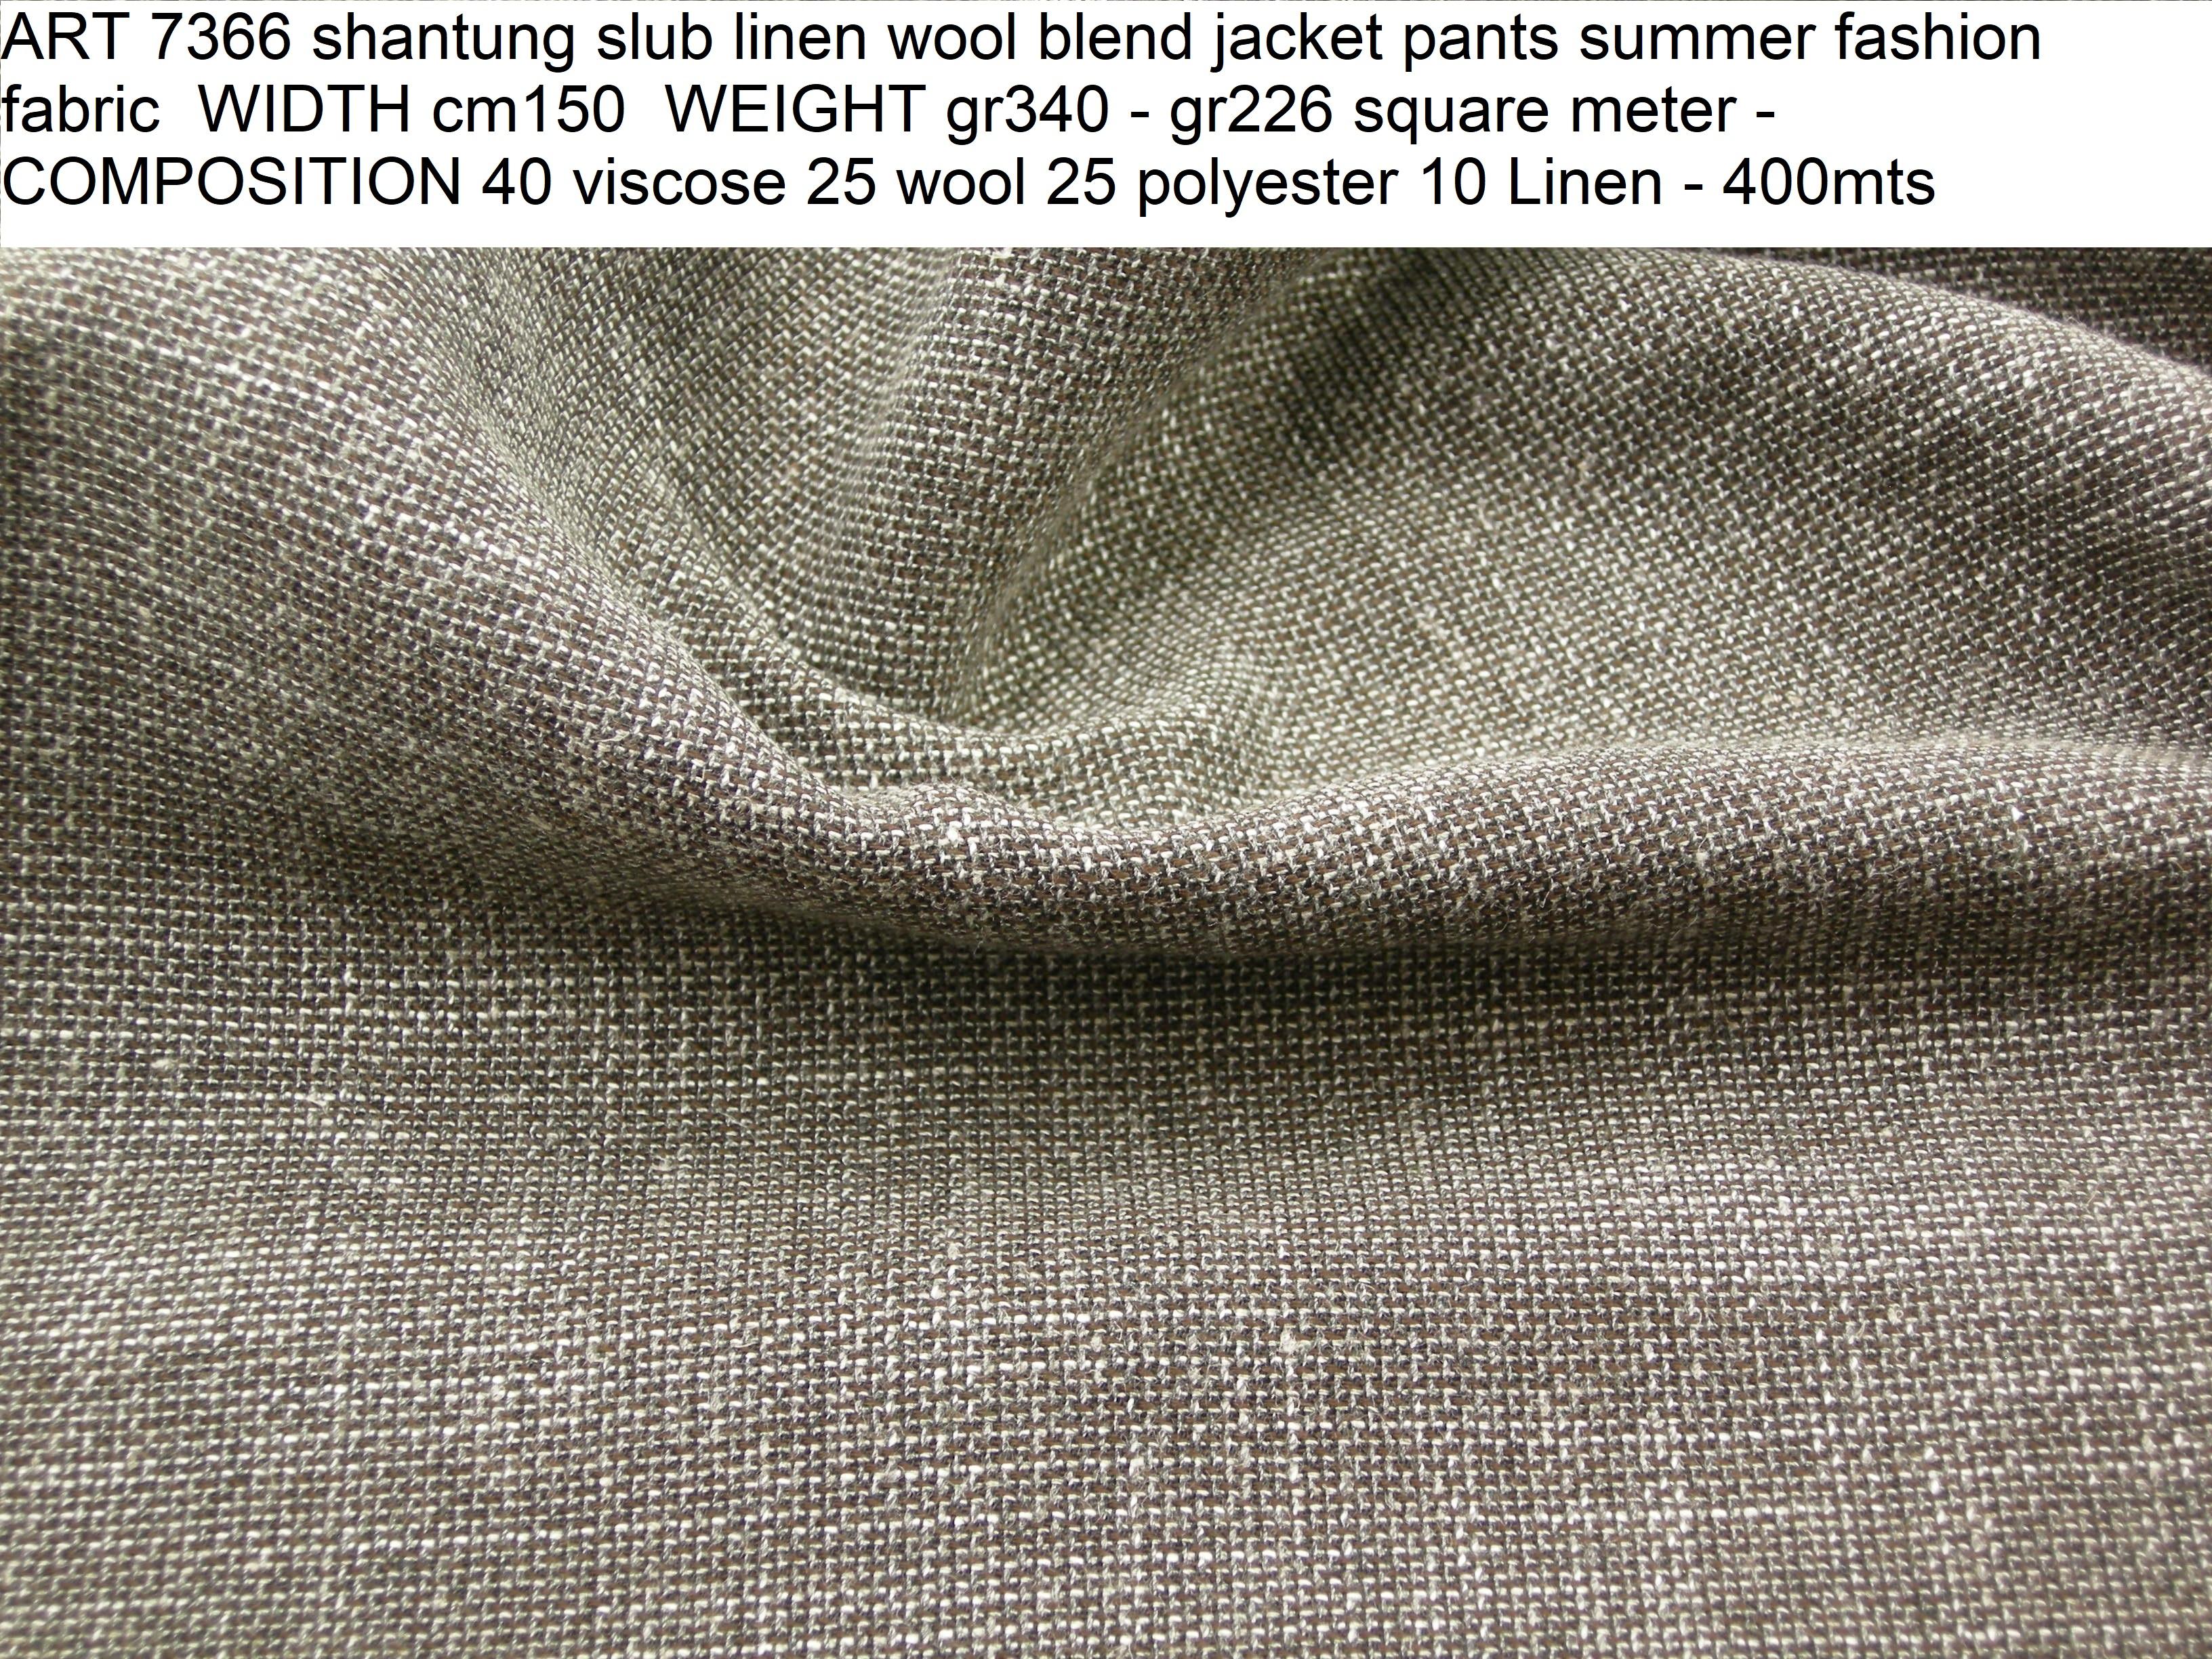 ART 7366 shantung slub linen wool blend jacket pants summer fashion fabric WIDTH cm150 WEIGHT gr340 - gr226 square meter - COMPOSITION 40 viscose 25 wool 25 polyester 10 Linen - 400mts